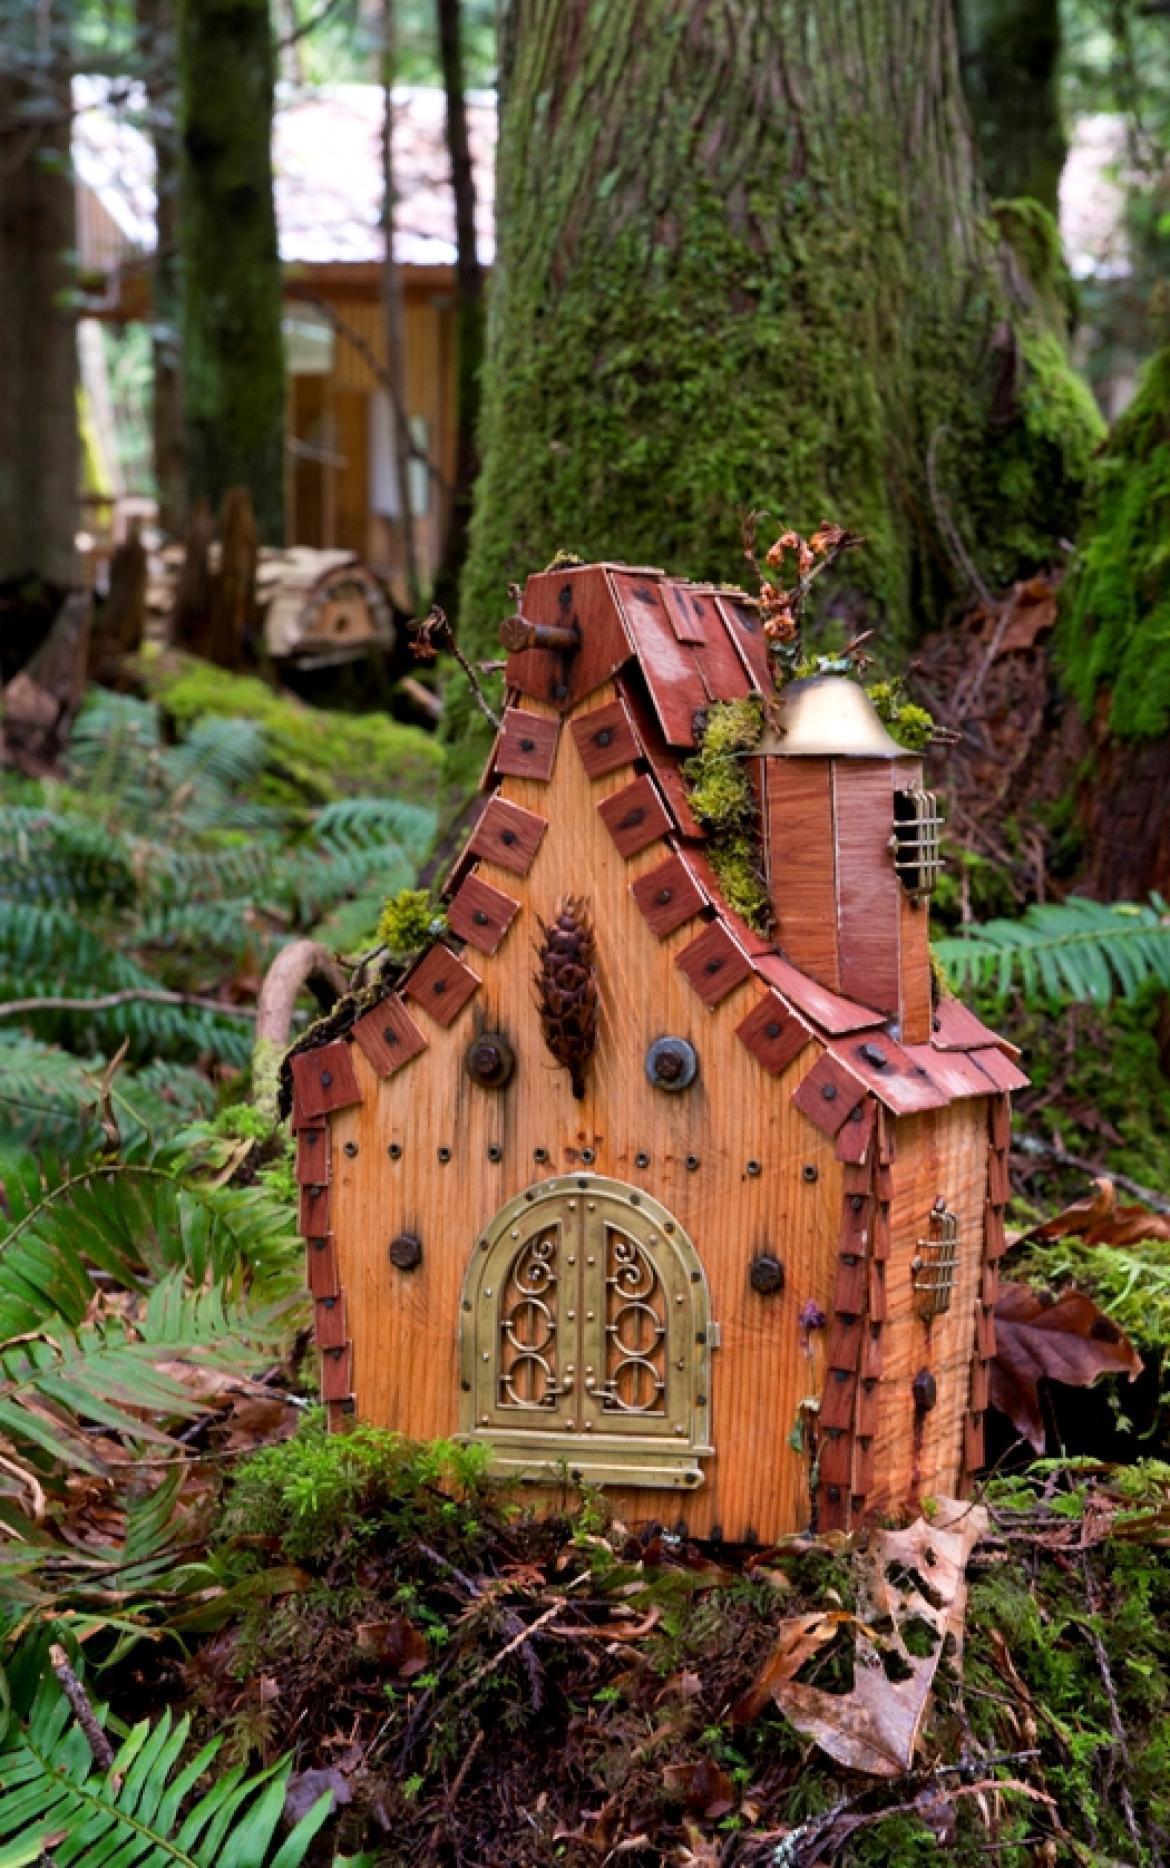 Visual Arts Students Create Gnome Village By The Sea at Milner ...